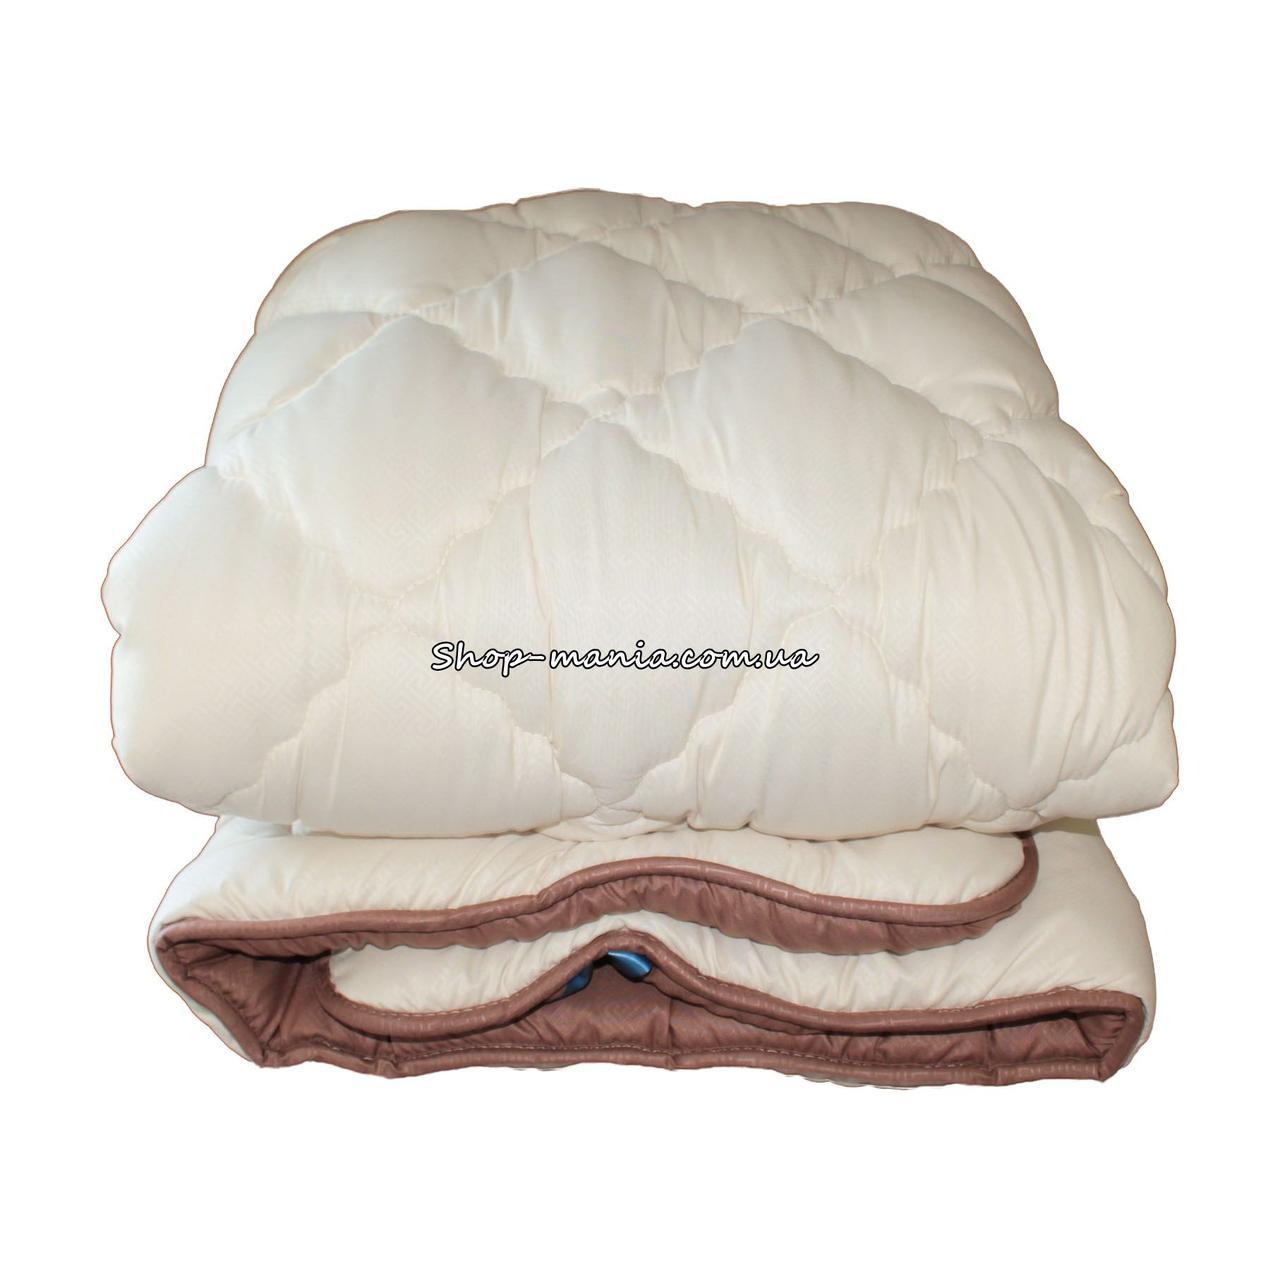 Одеяло зимнее теплое стеганное полуторное 155х210 см холлофайбер ODA SM 8007-1 biege and brown